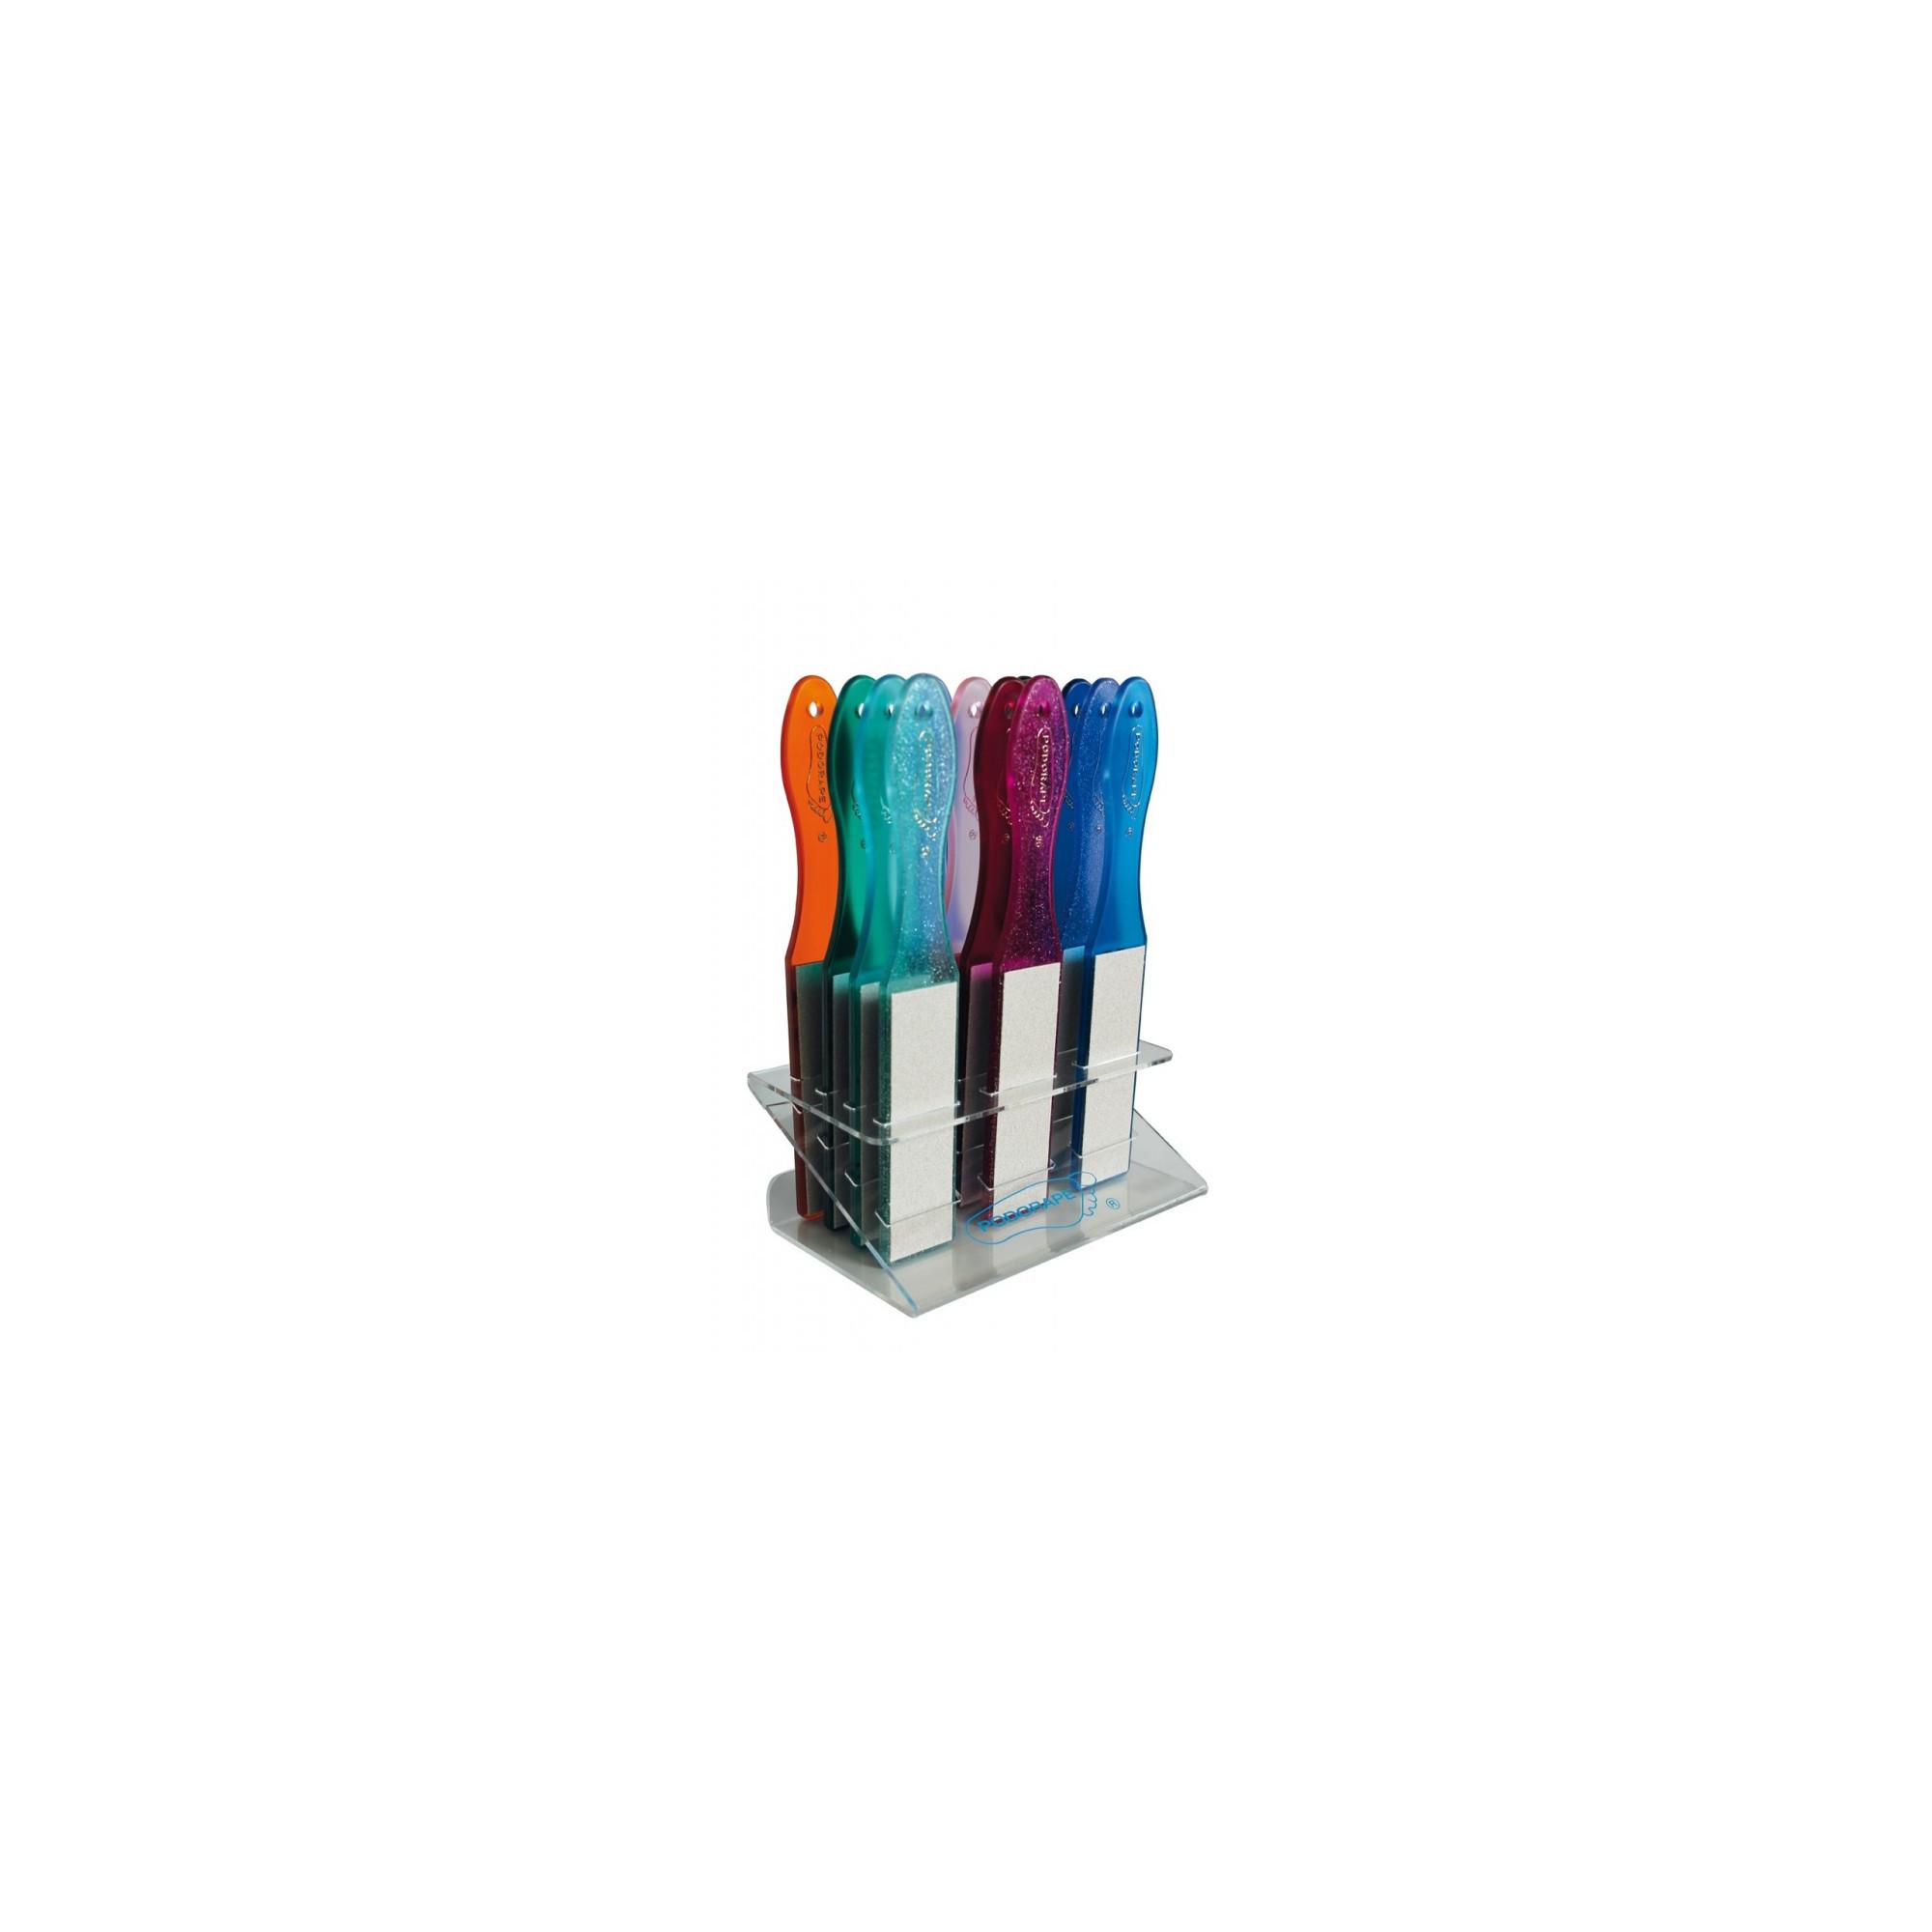 Présentoir Podorape - Multicolore - 12 Râpes